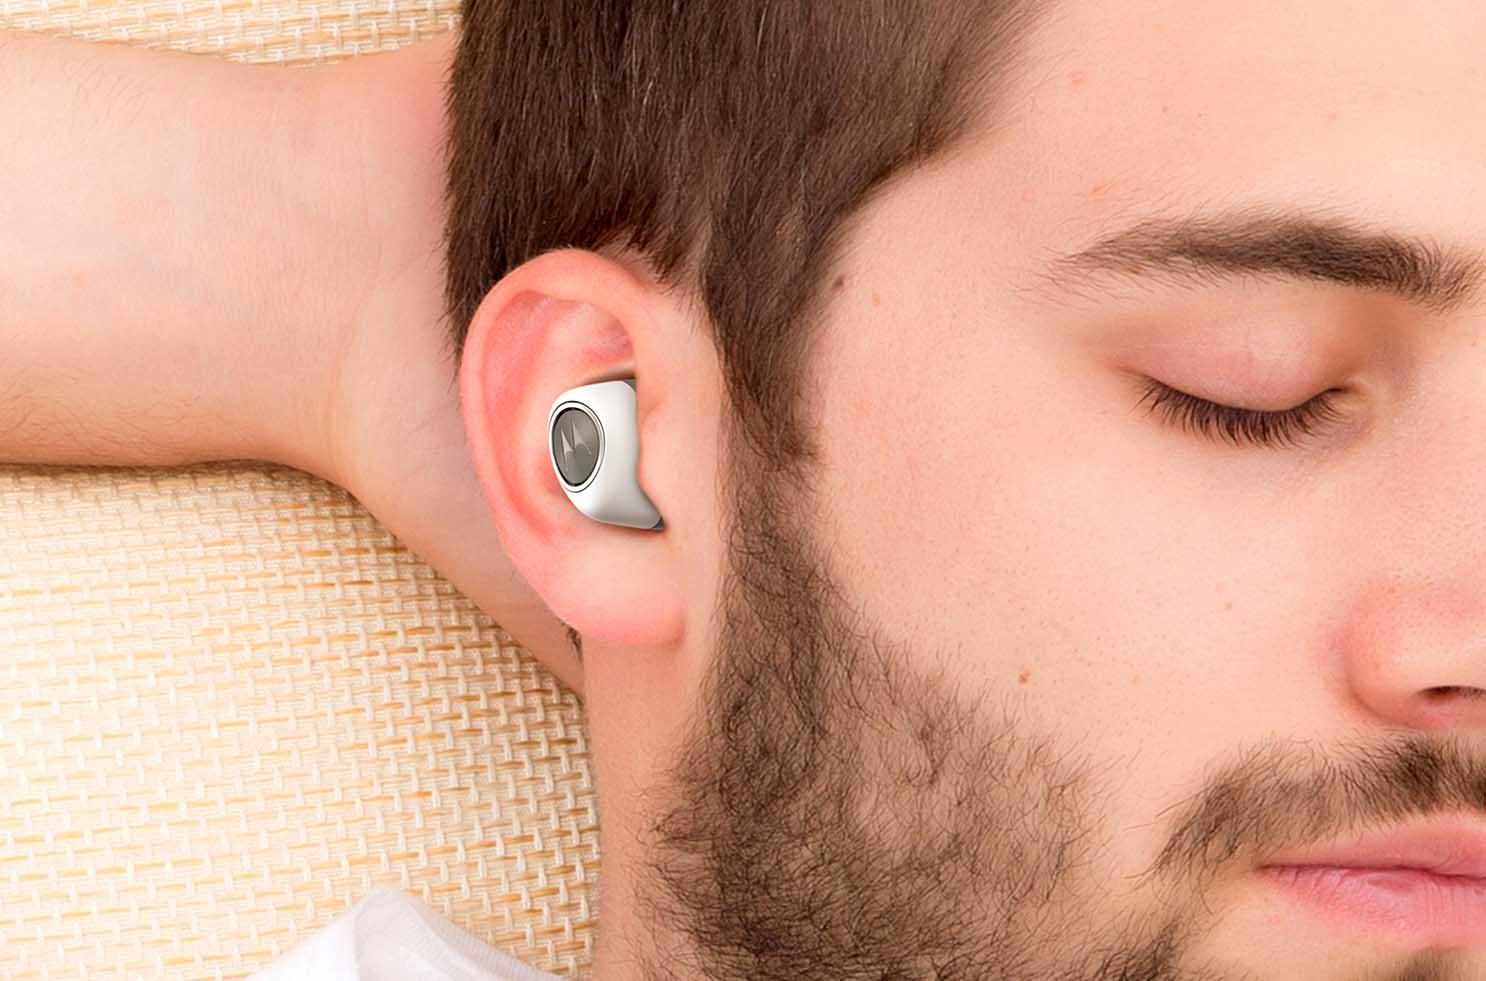 Motorola Verve Ones ME 開售 HK$1,299  聽歌最長八個鐘